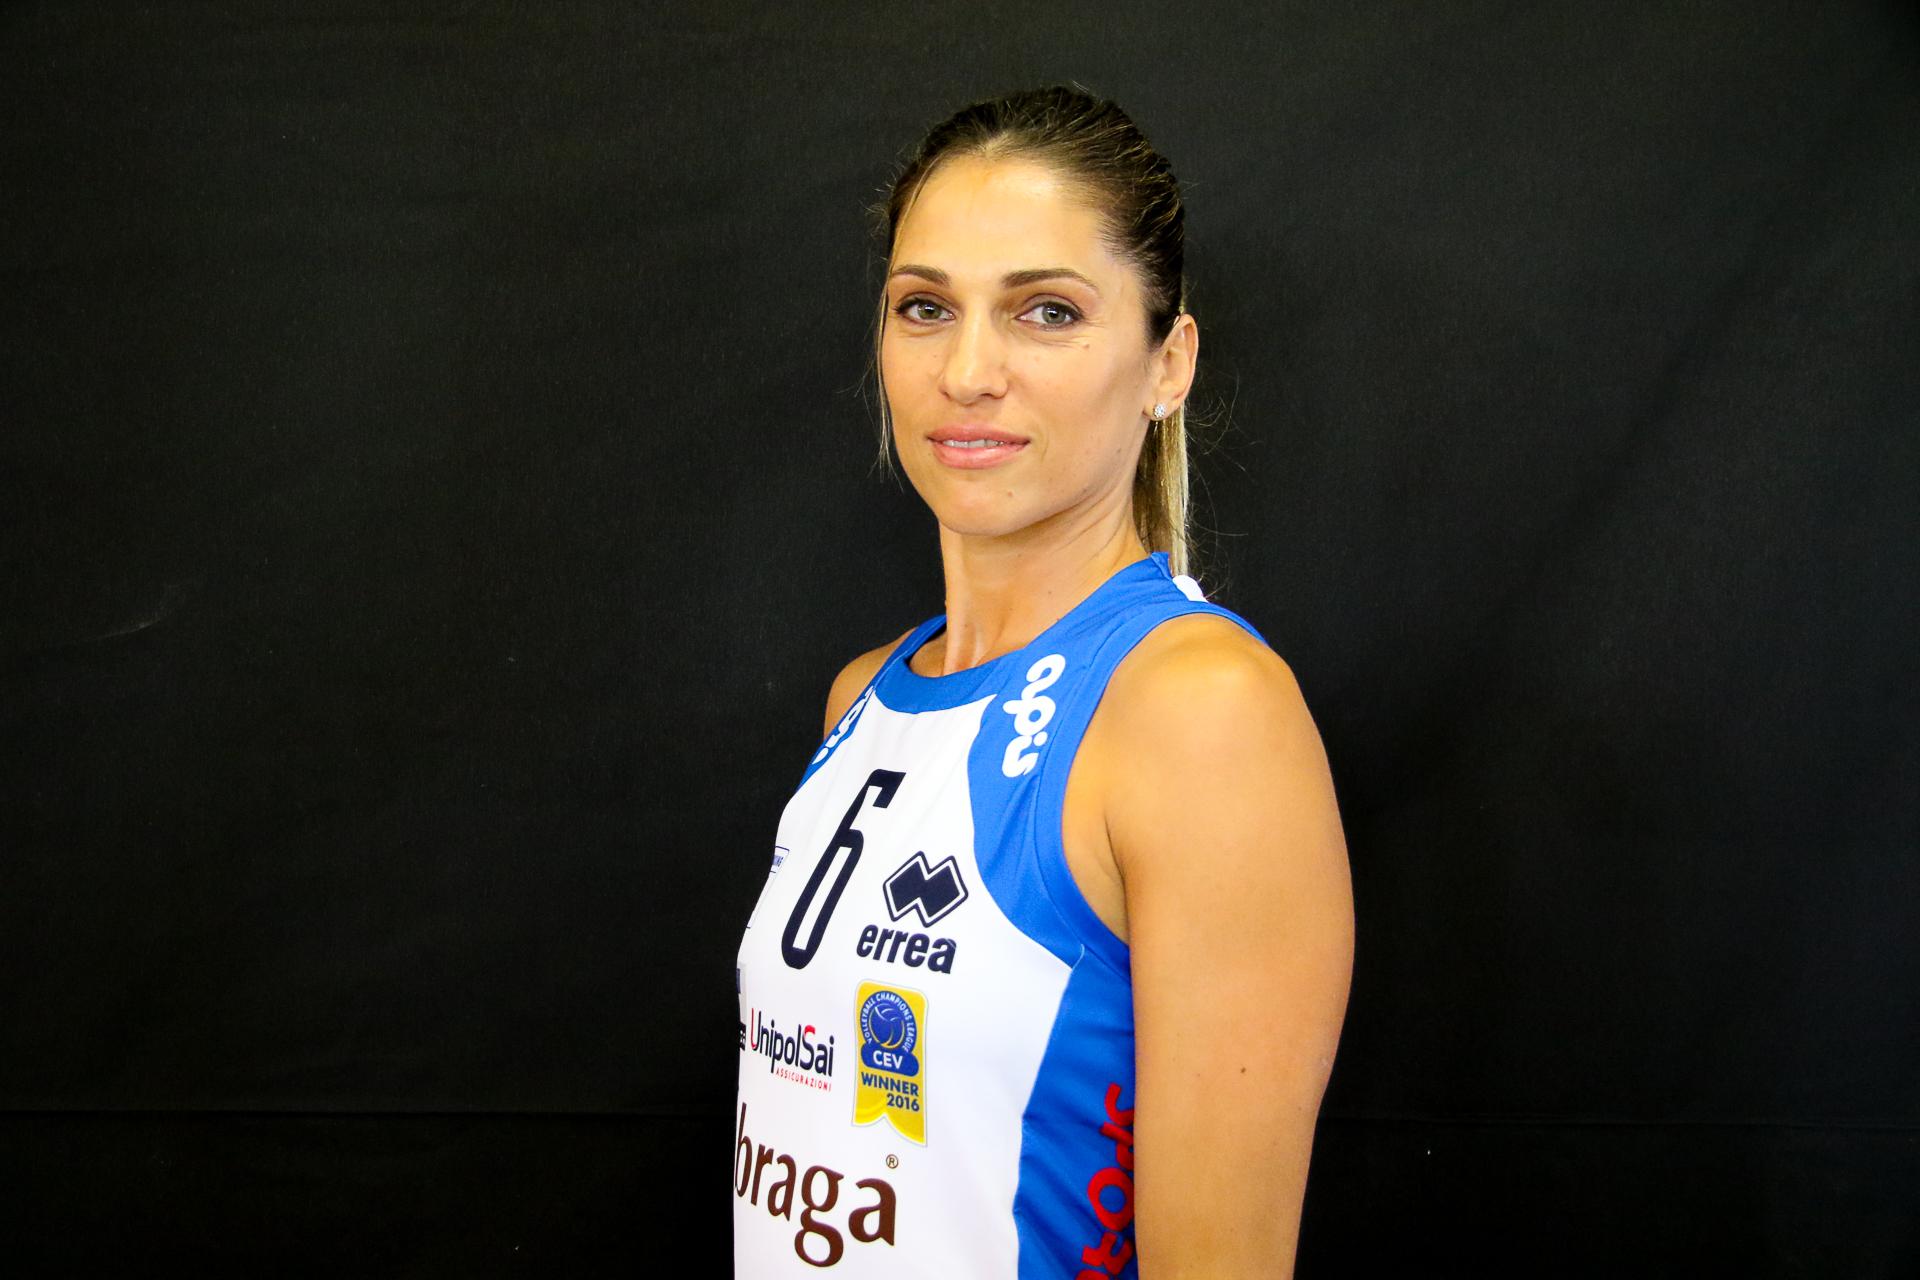 Carmen Marinela Turlea